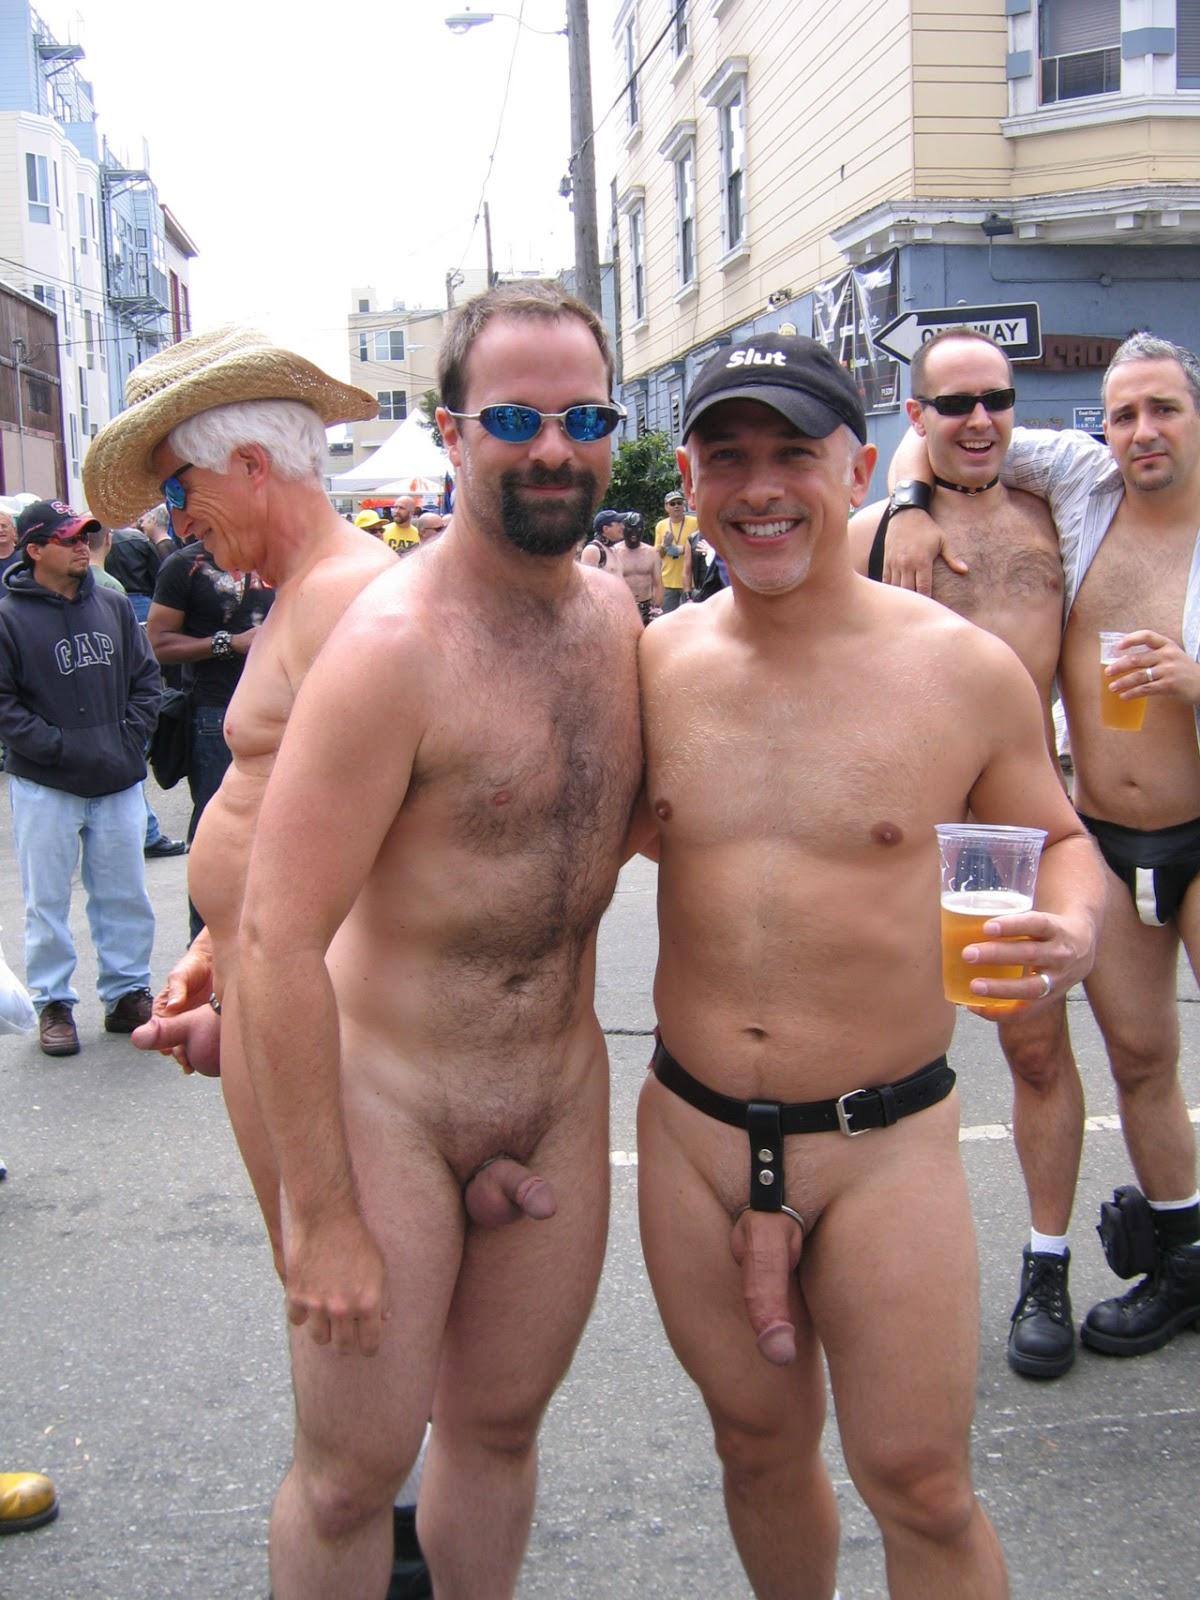 Naked man public nude